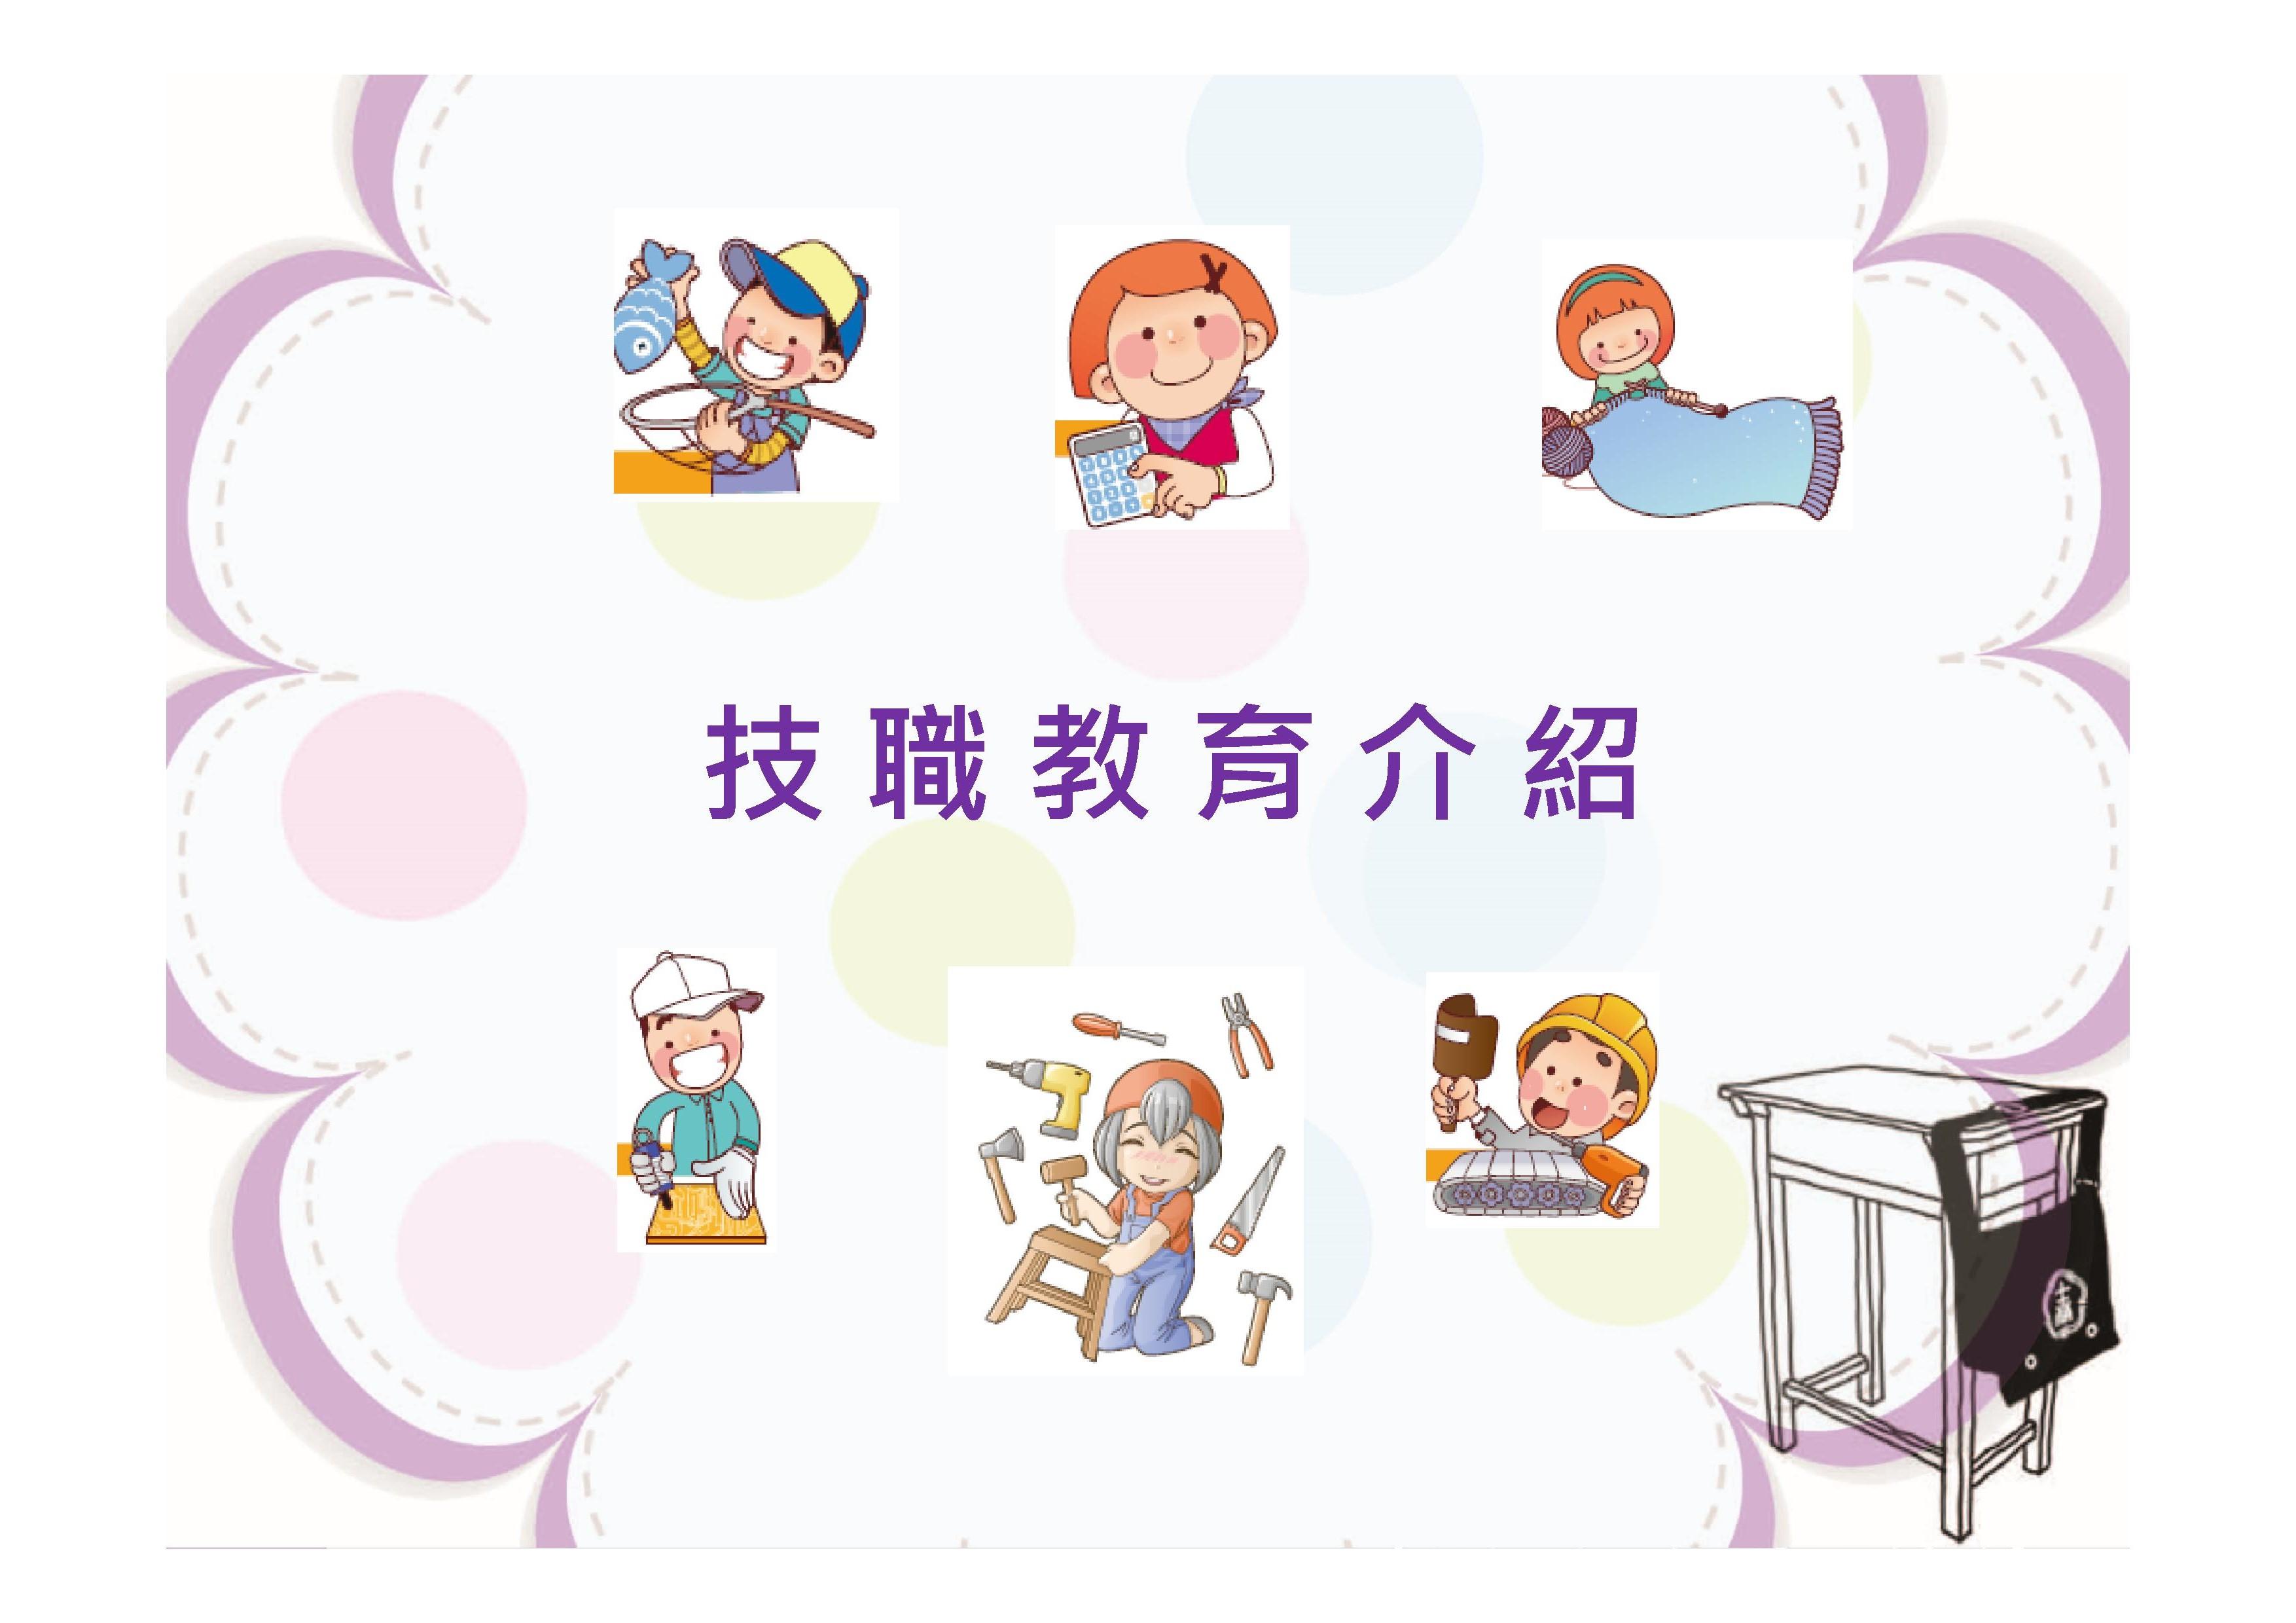 Microsoft PowerPoint - 技職教育暨士商簡介.pptx0002